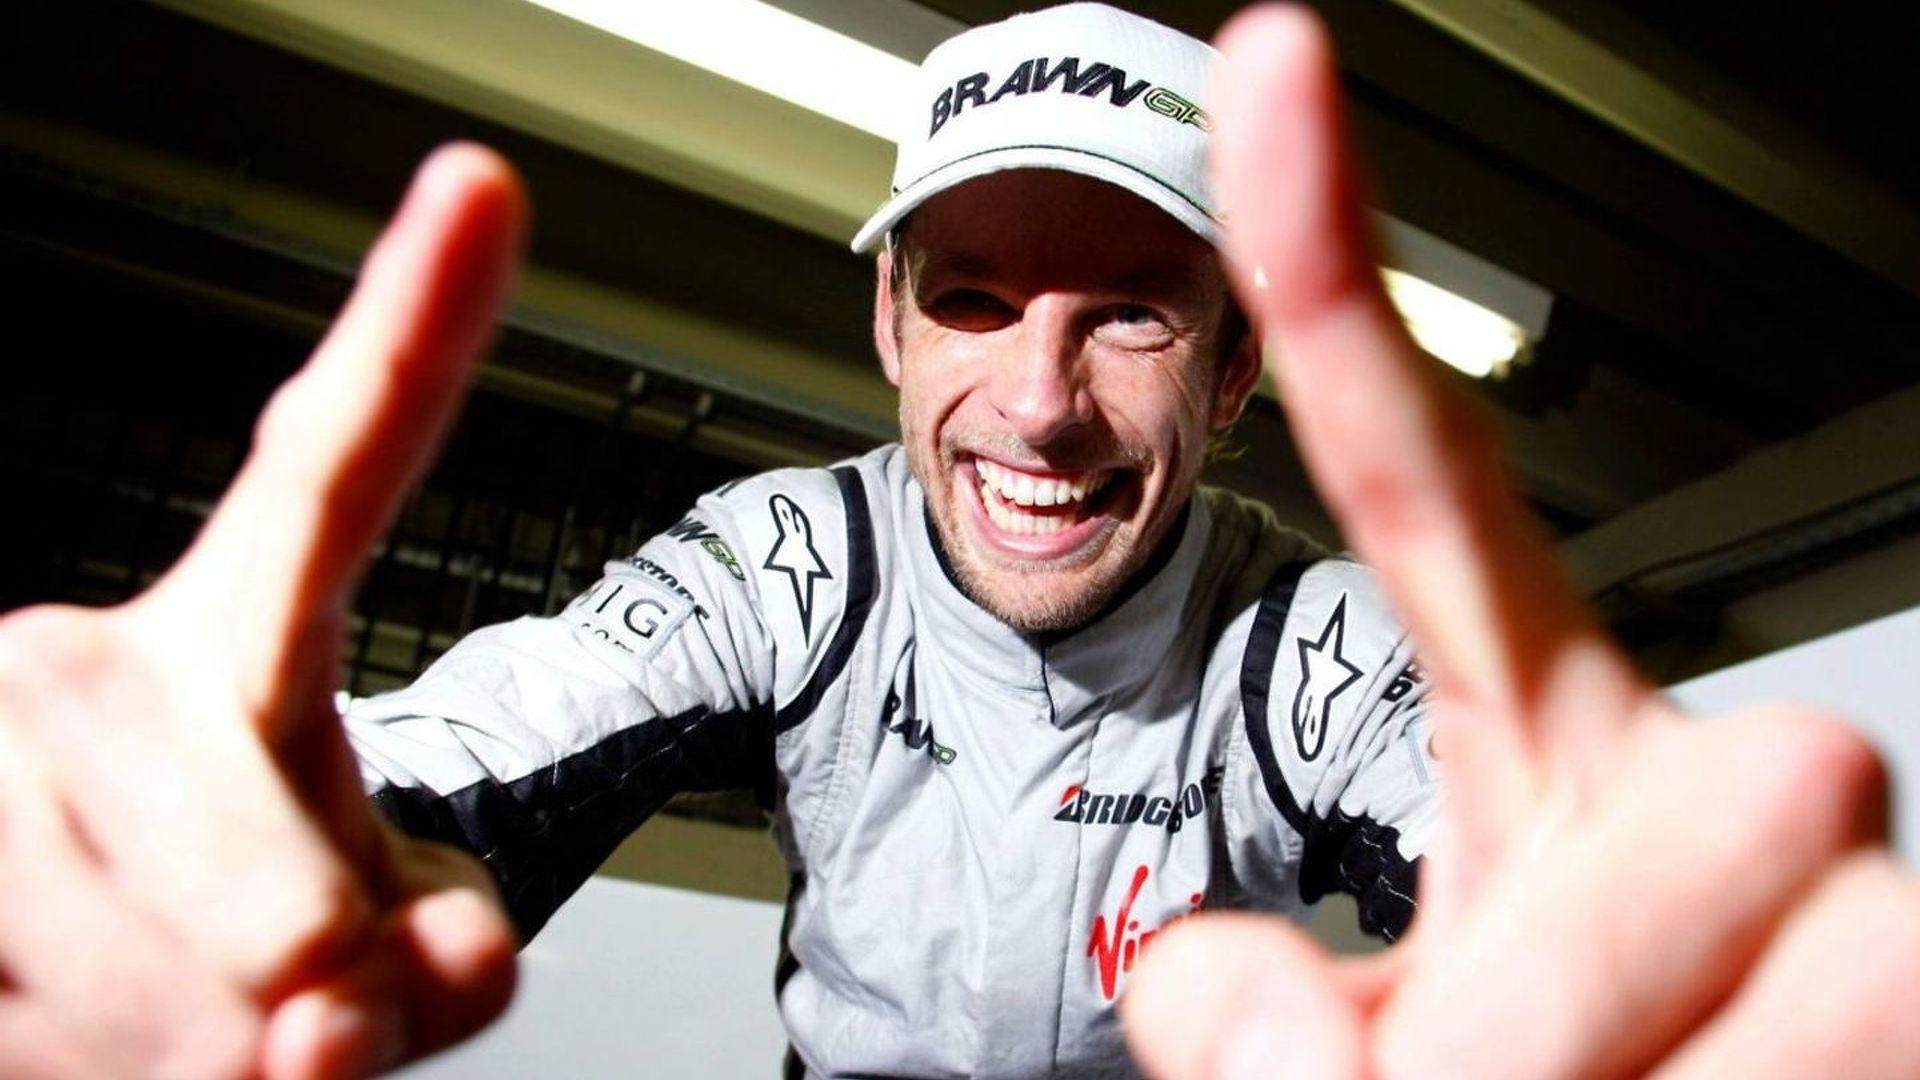 Lauda defends Button amid more criticism